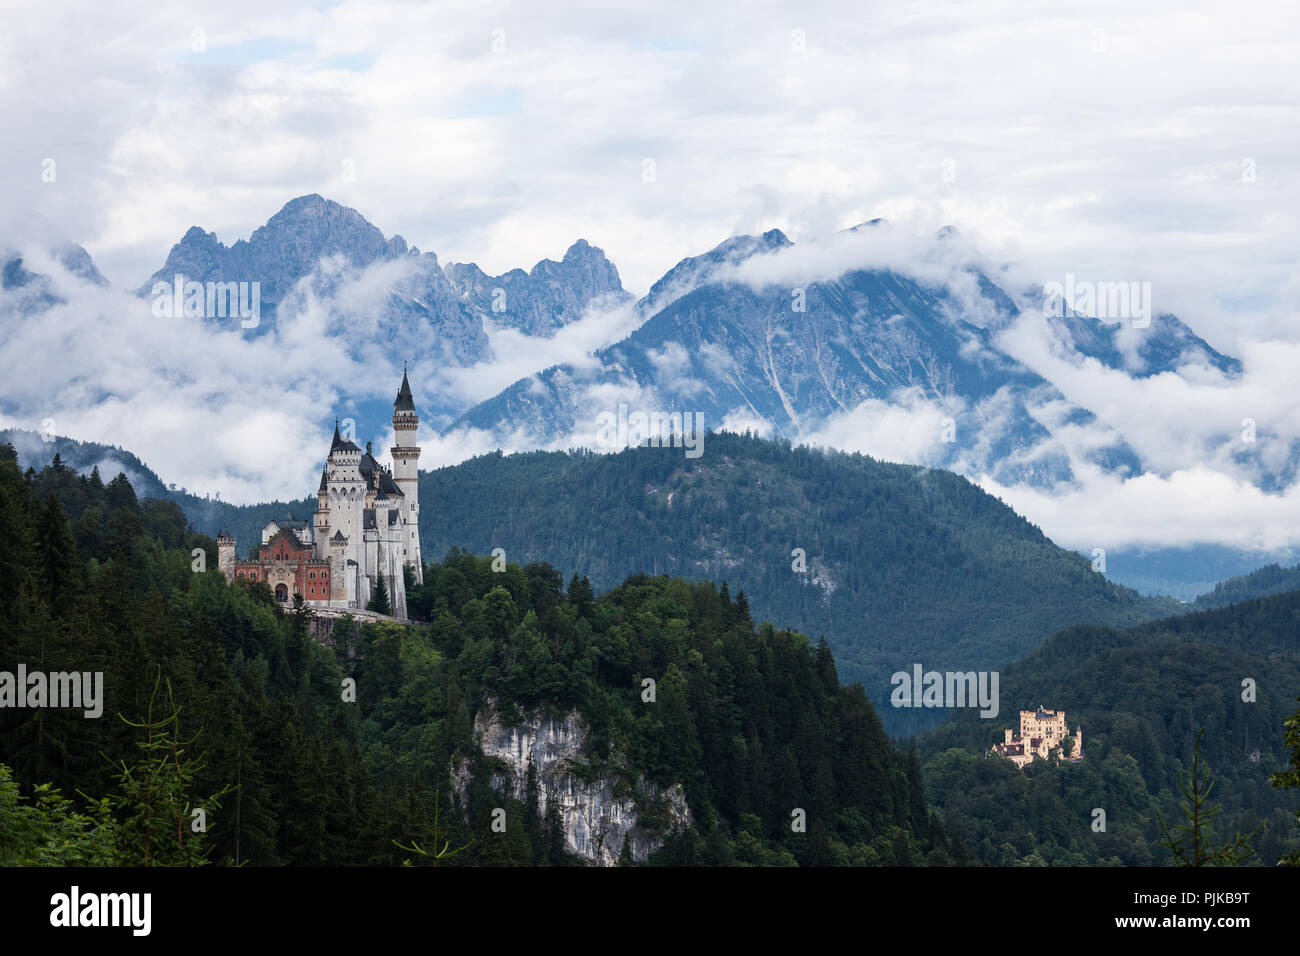 Beautiful view of world-famous Neuschwanstein Castle. Bavaria, Germany - Stock Image